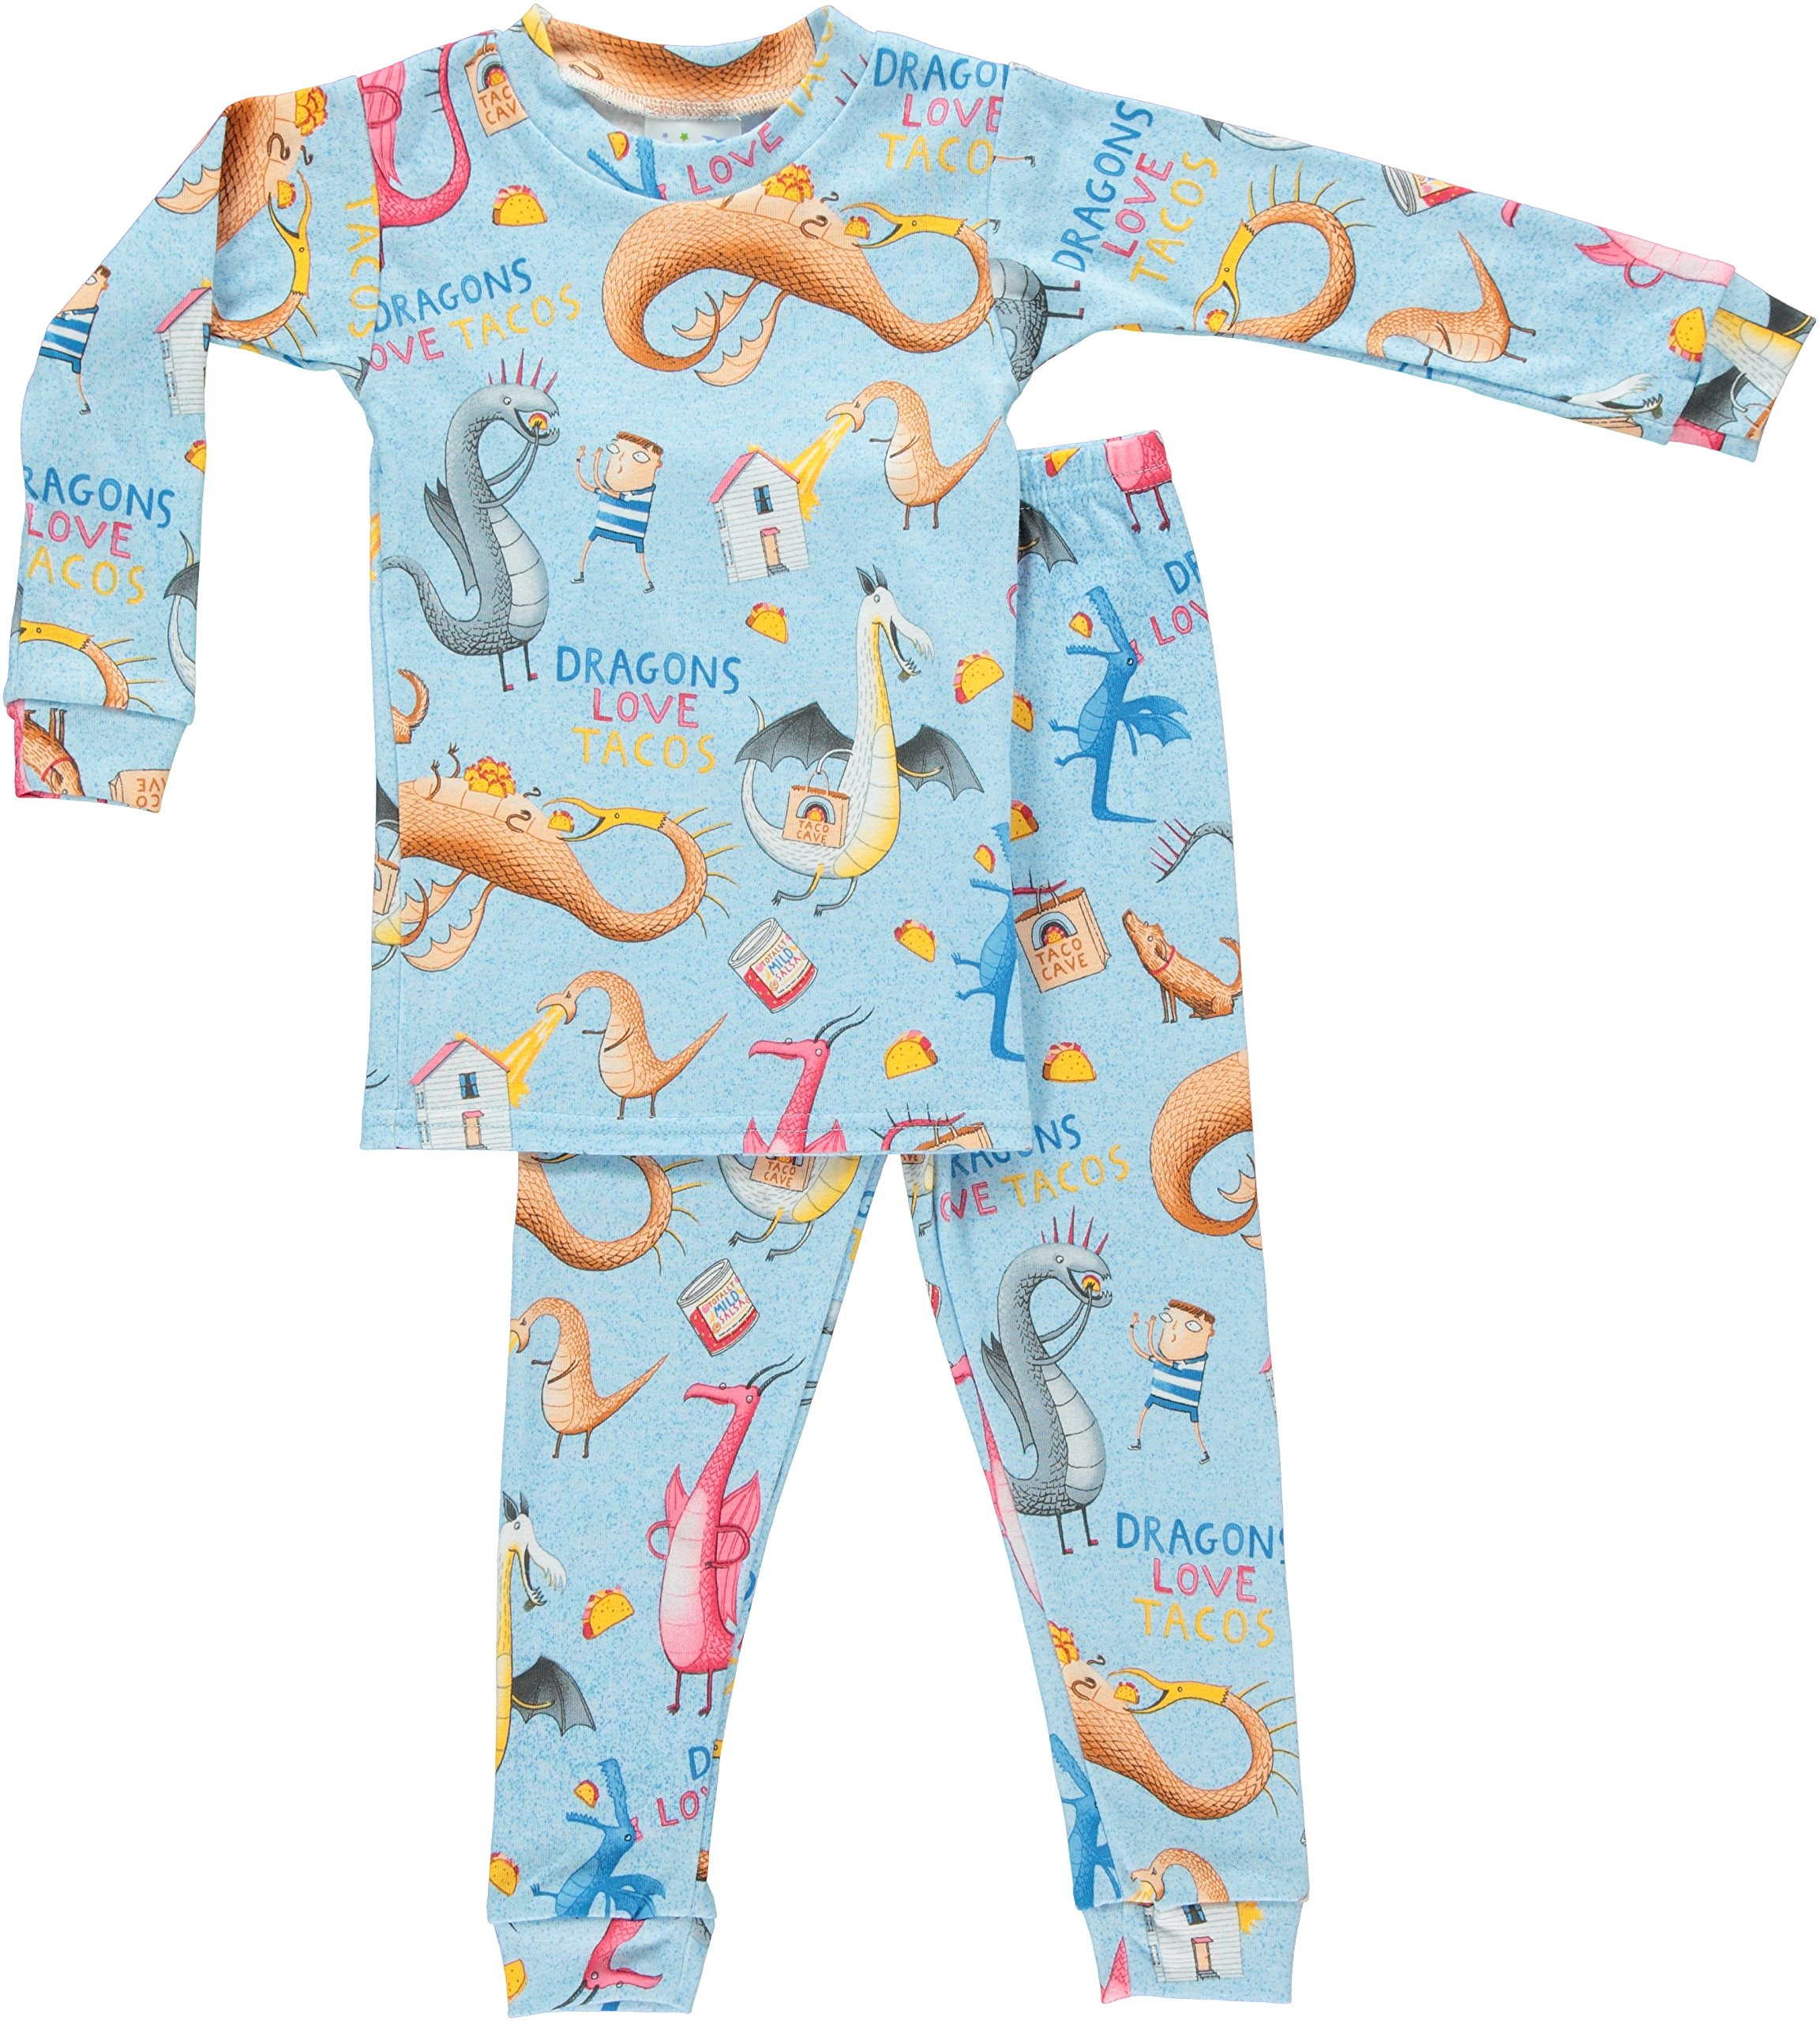 Books to Bed Dragons Love Tacos Kids Pajamas Set (6X7)